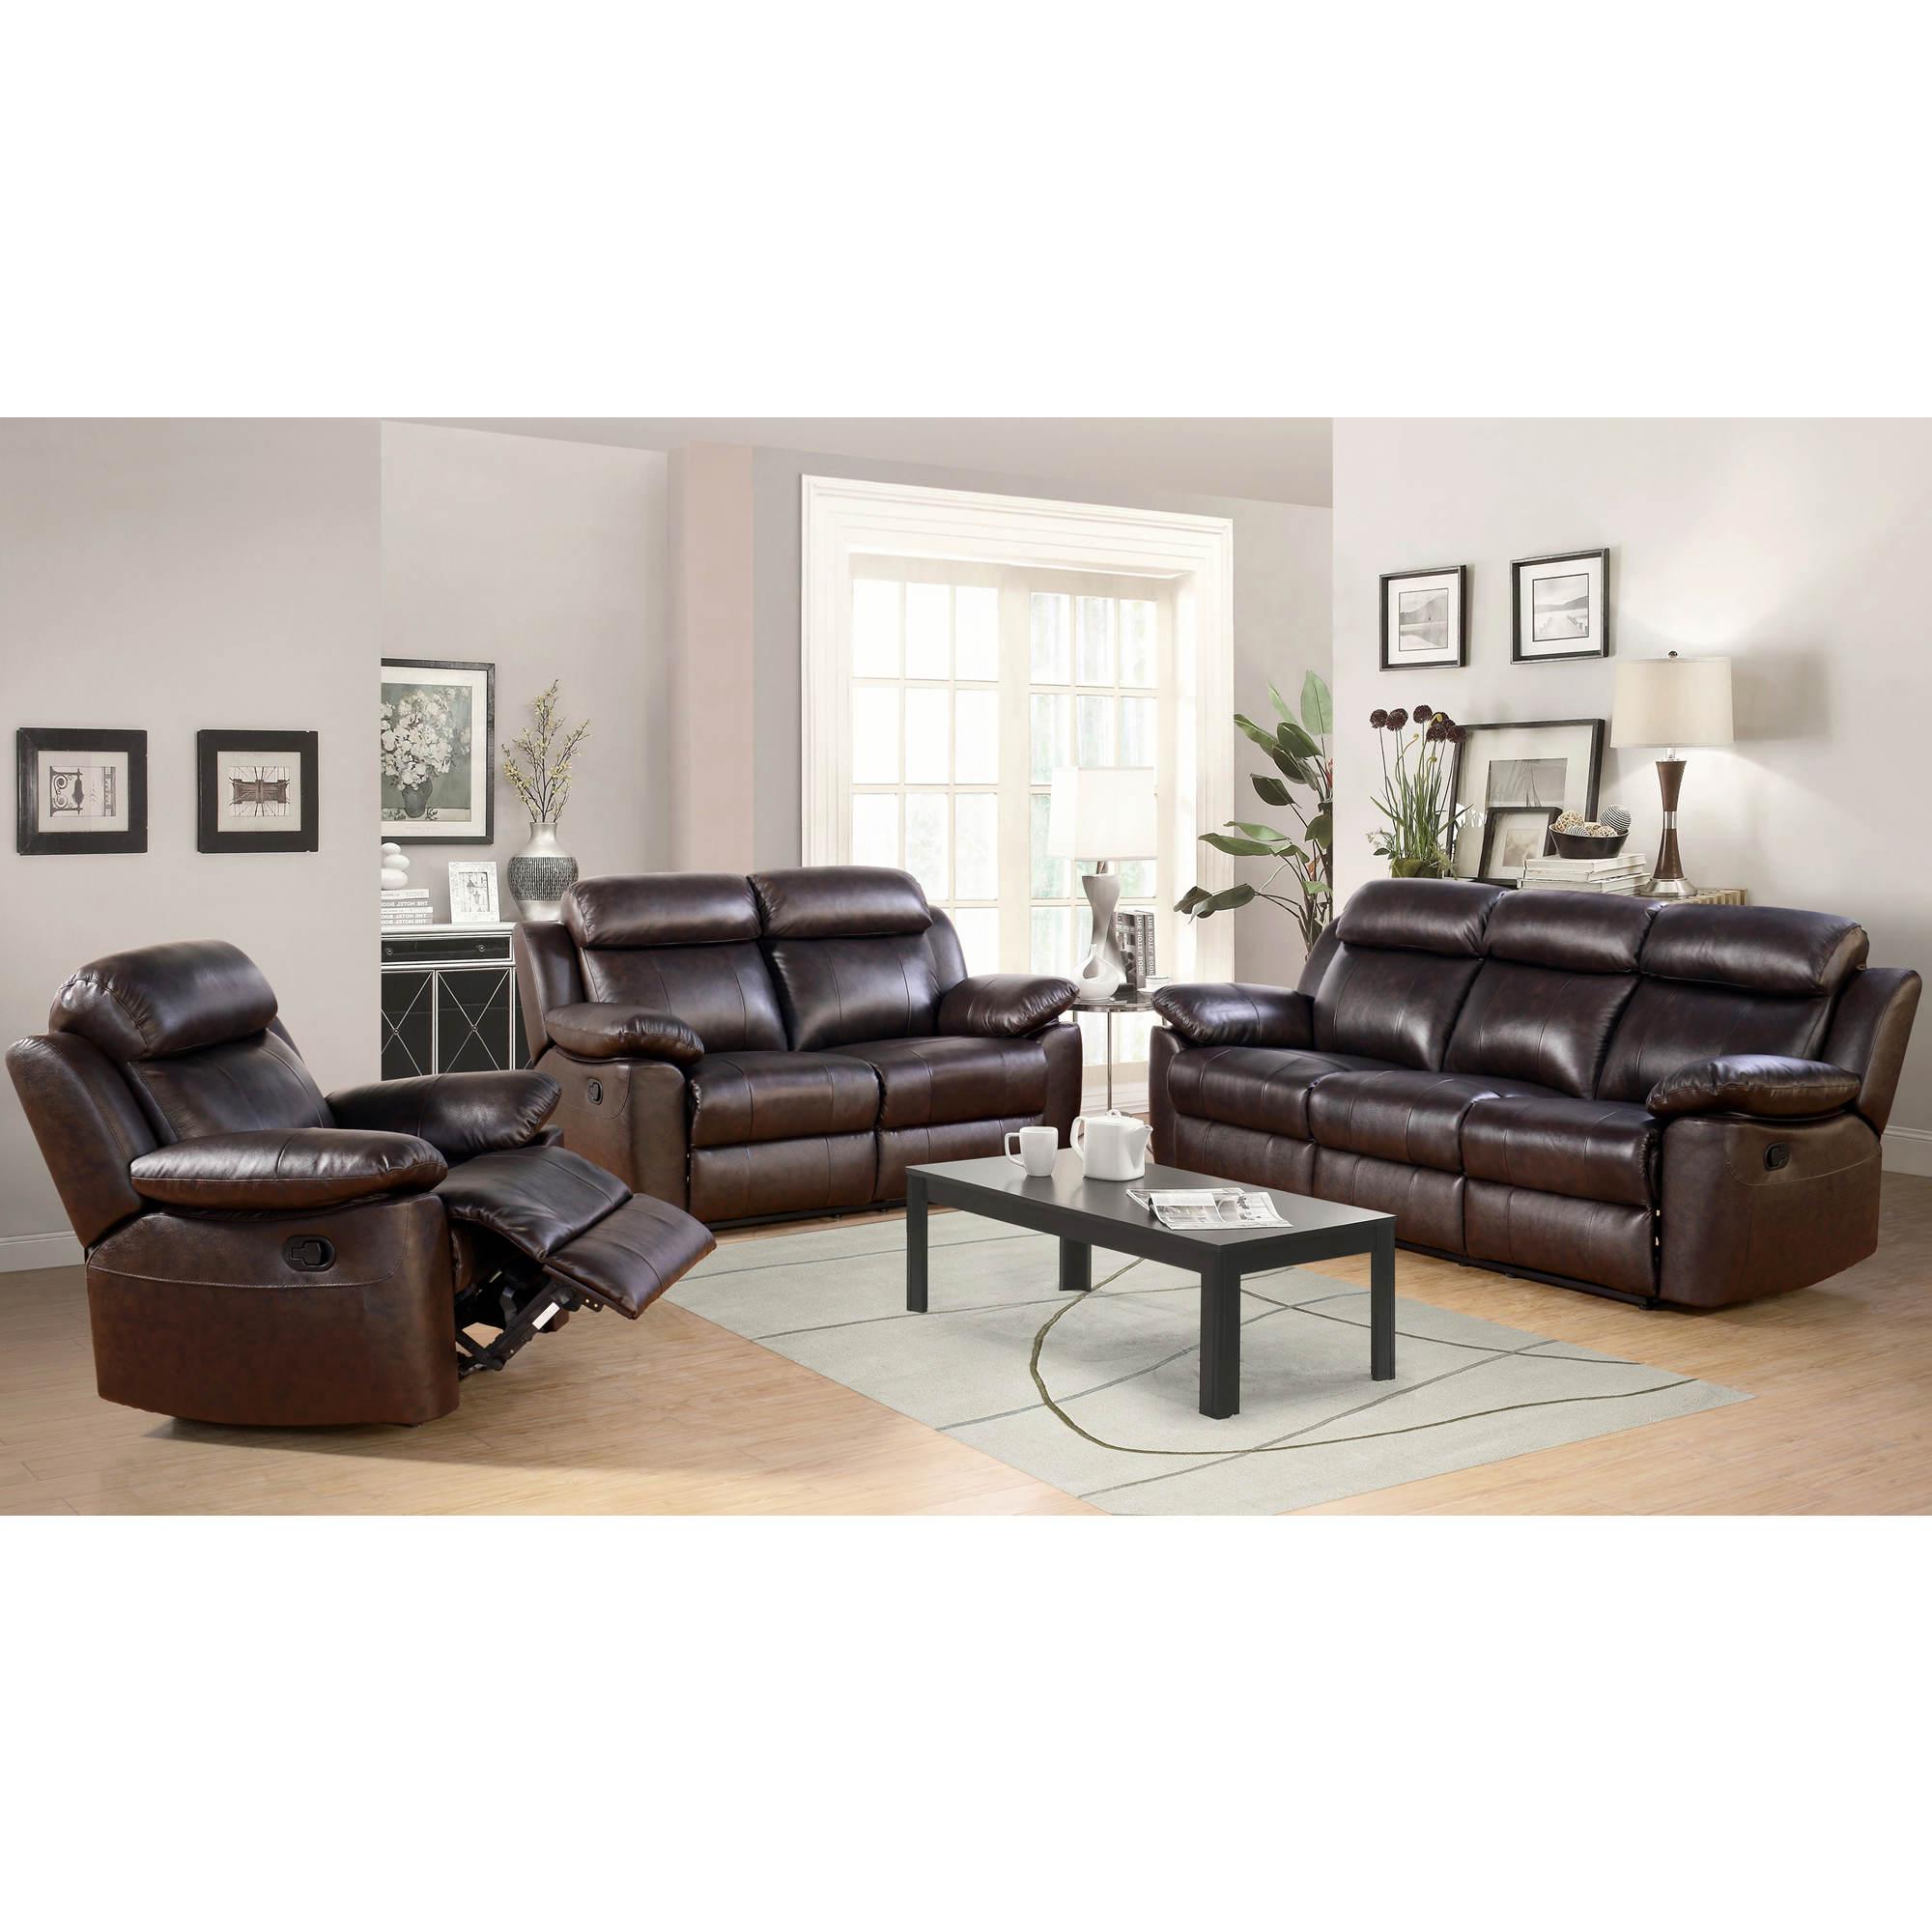 Abbyson living braylen 3 pc leather reclining set bj 39 s for Abbyson living sedona leather chaise recliner